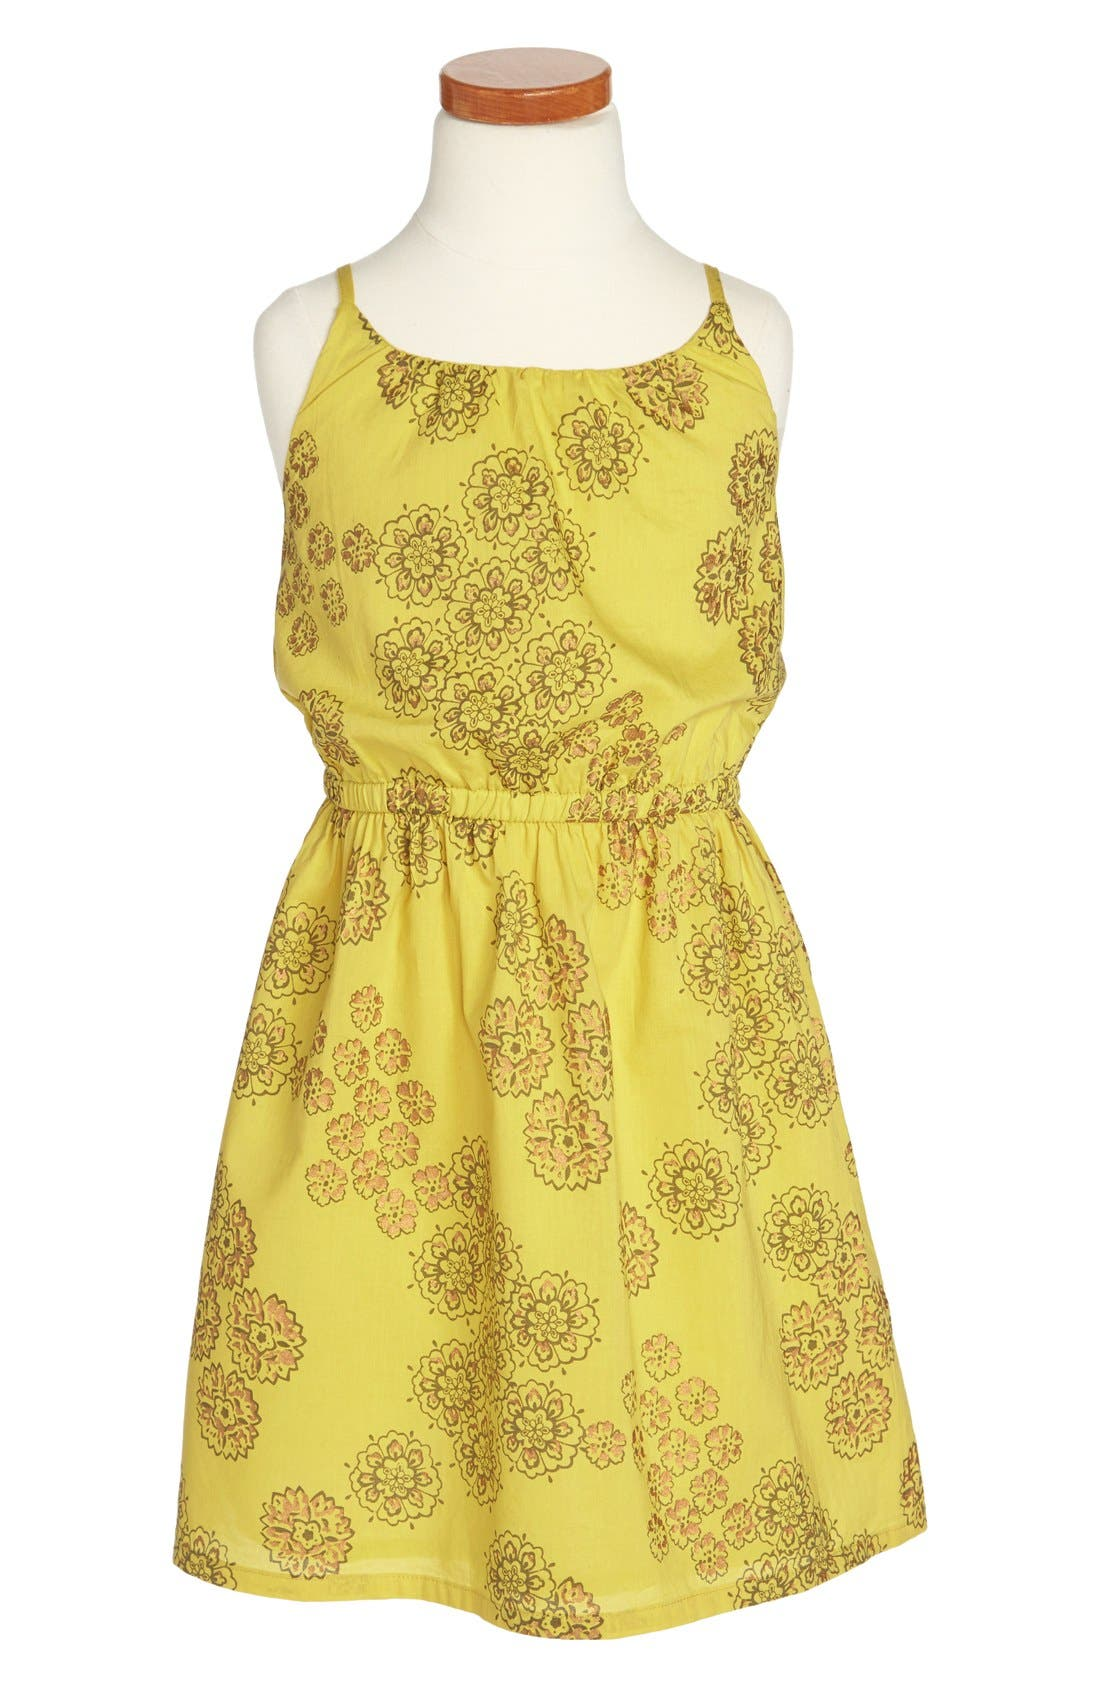 Alternate Image 1 Selected - Peek 'Violet' Cotton Sundress (Toddler Girls, Little Girls & Big Girls)